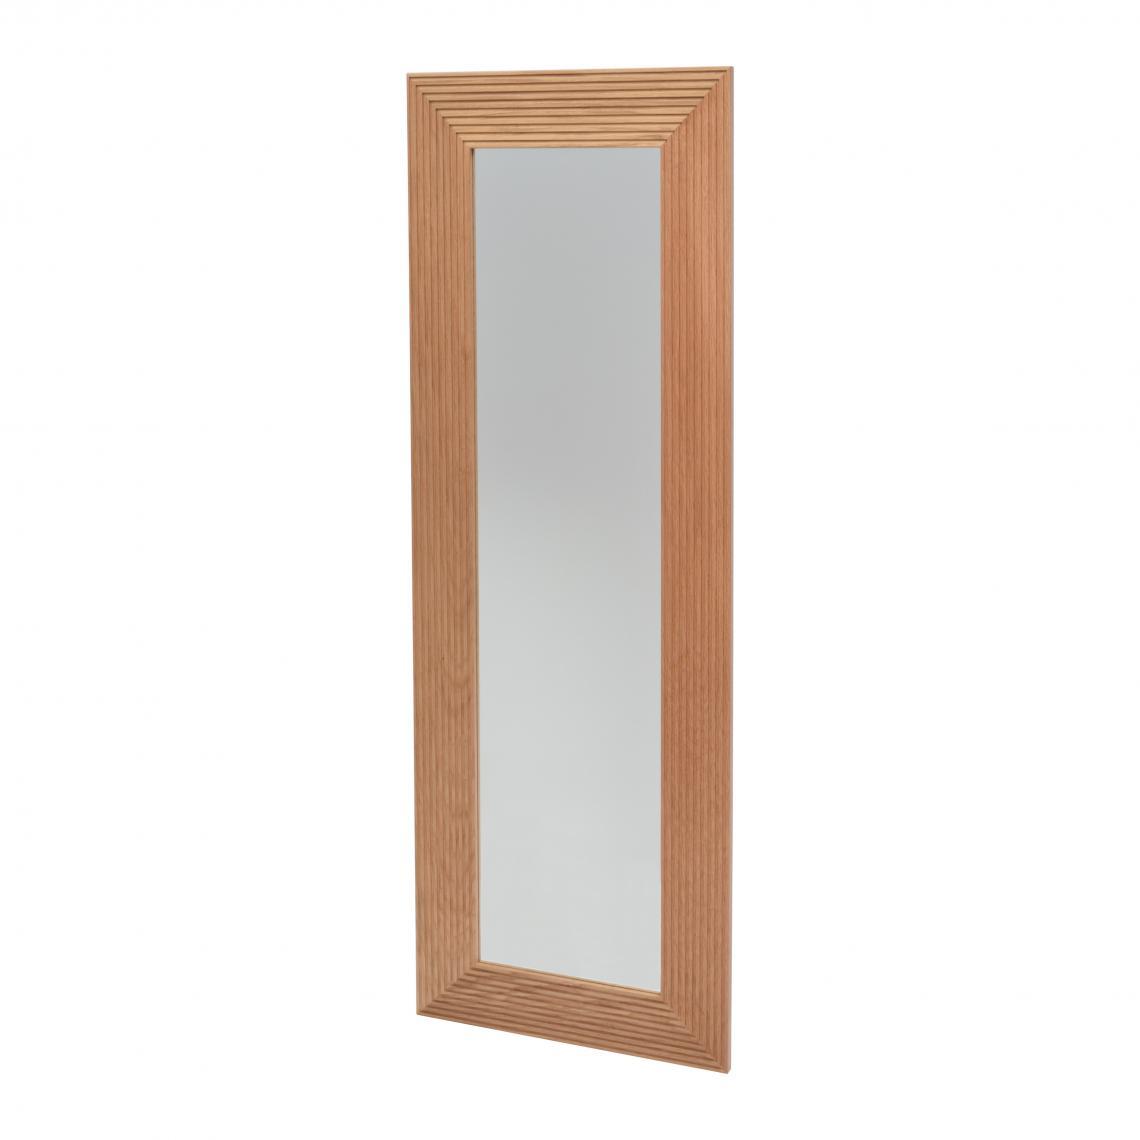 Miroir Rectangulaire Bois Chene Massif 120x30cm Kowy